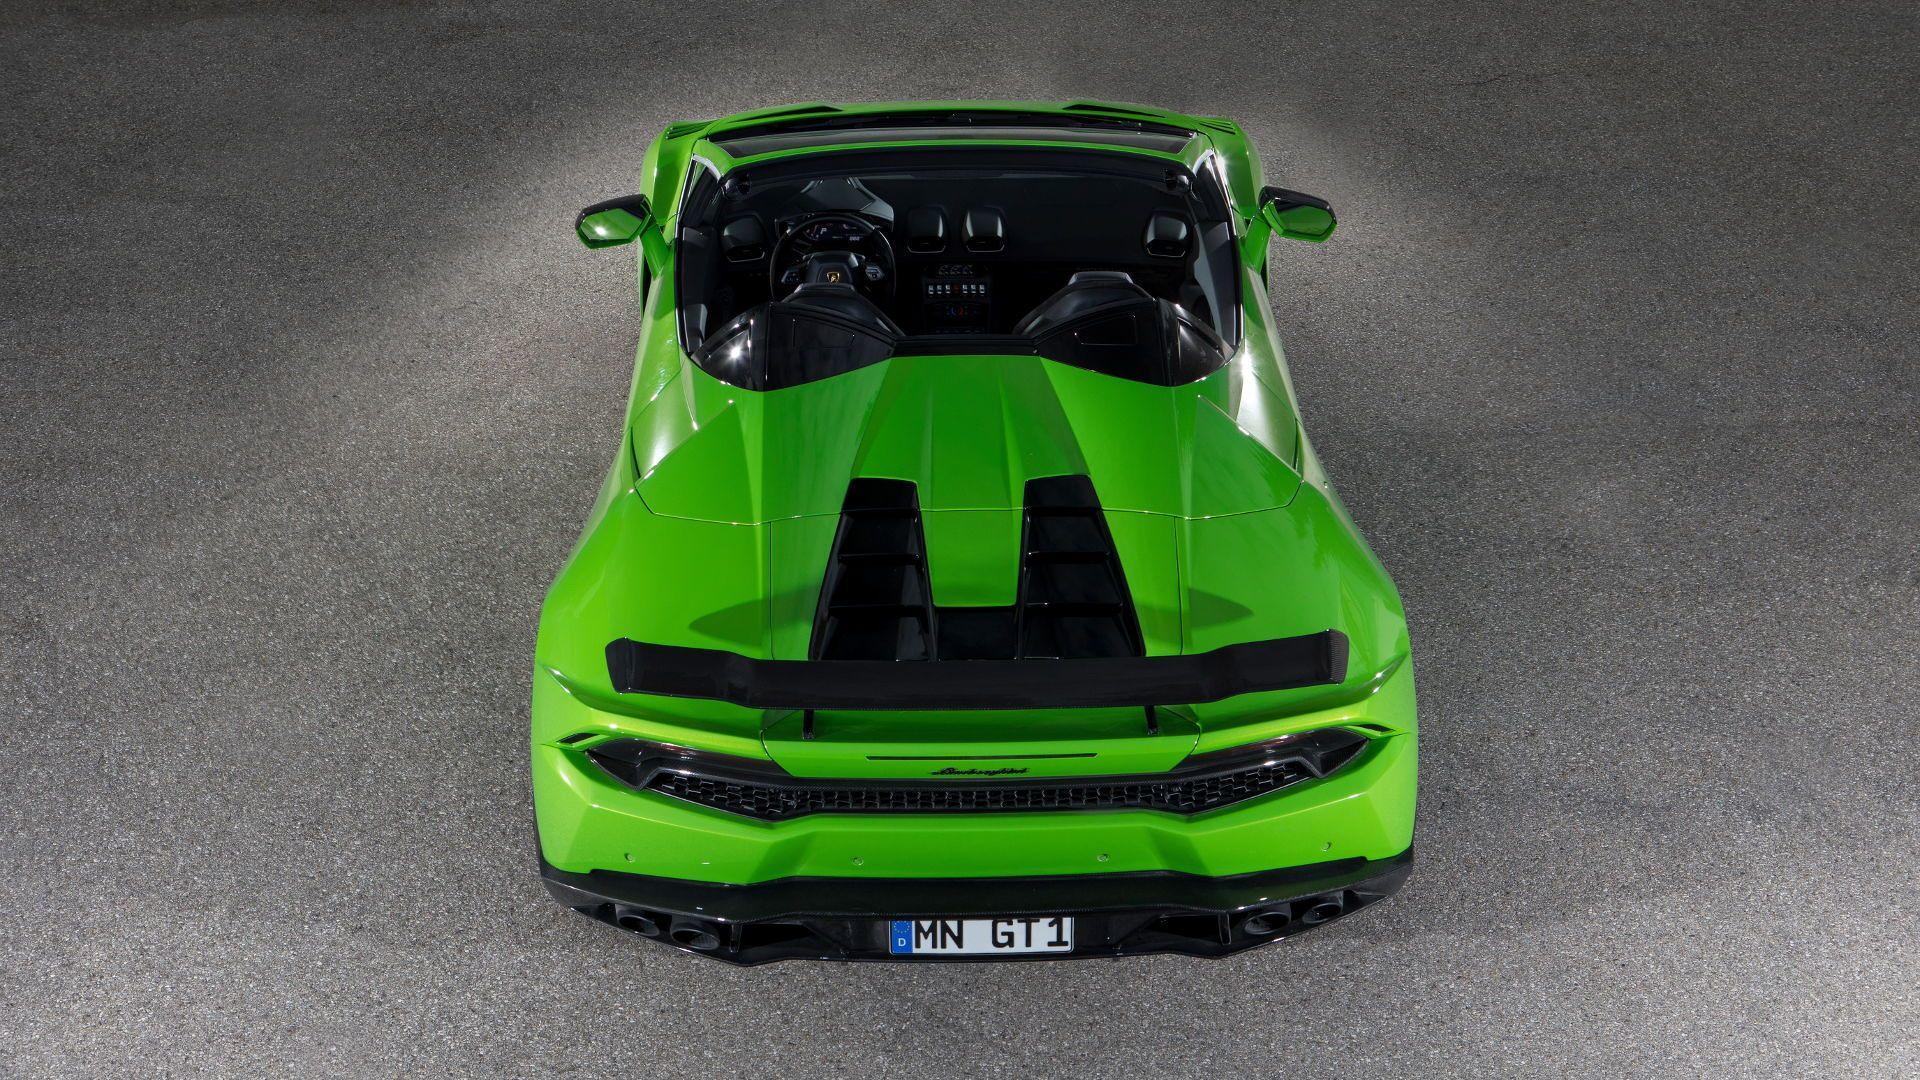 Lamborghini Huracan Spyder by Novitec (15)